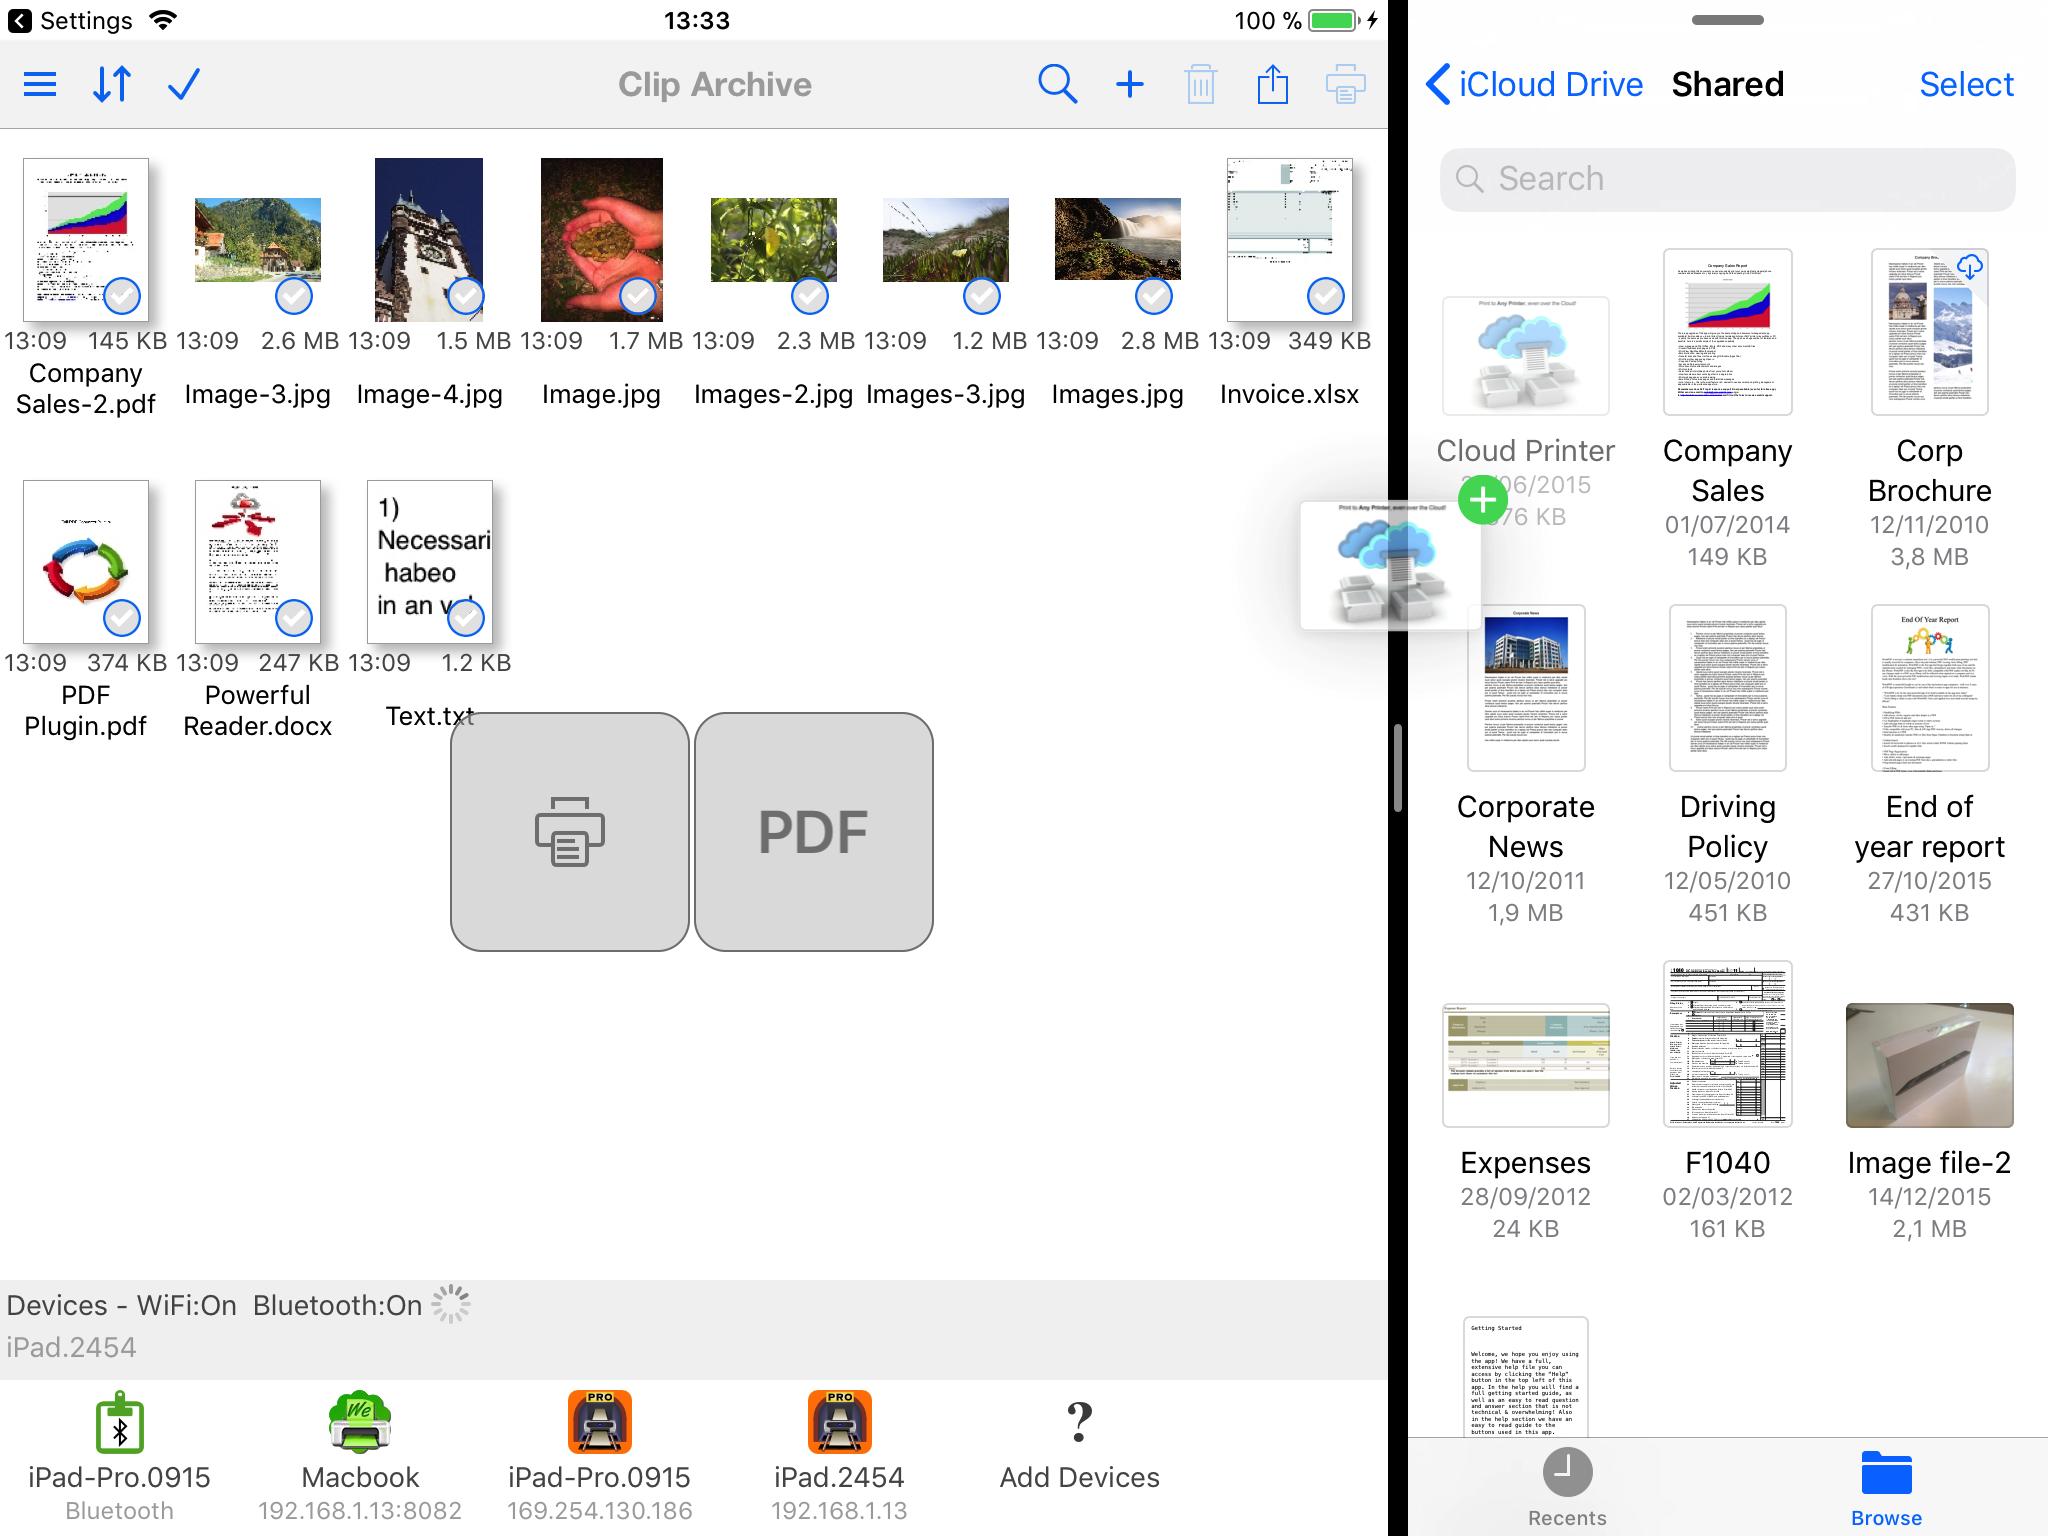 PrintCentral Pro: The Best File Management App